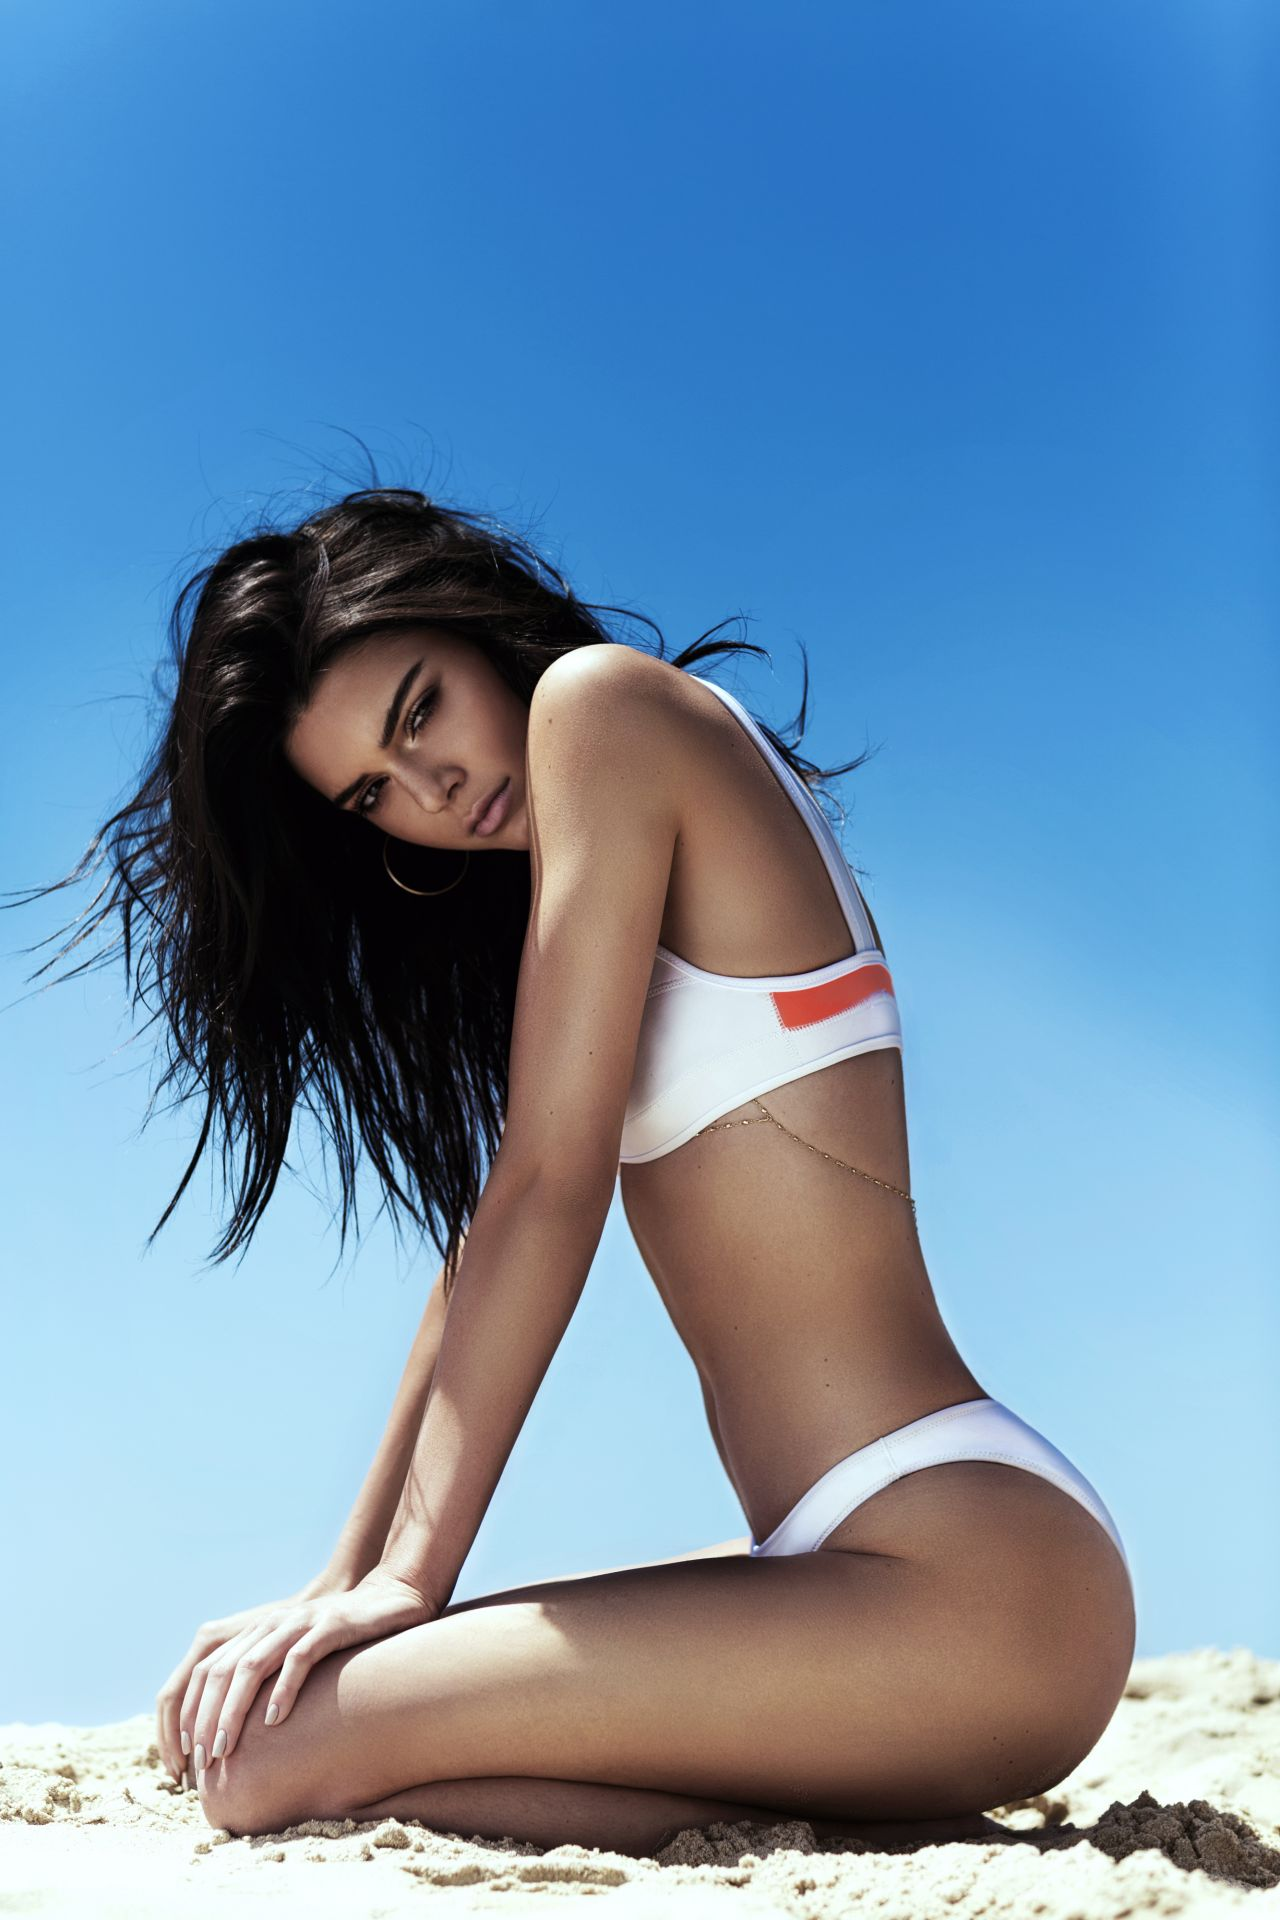 Kendall jenner sexy photoshoot 6